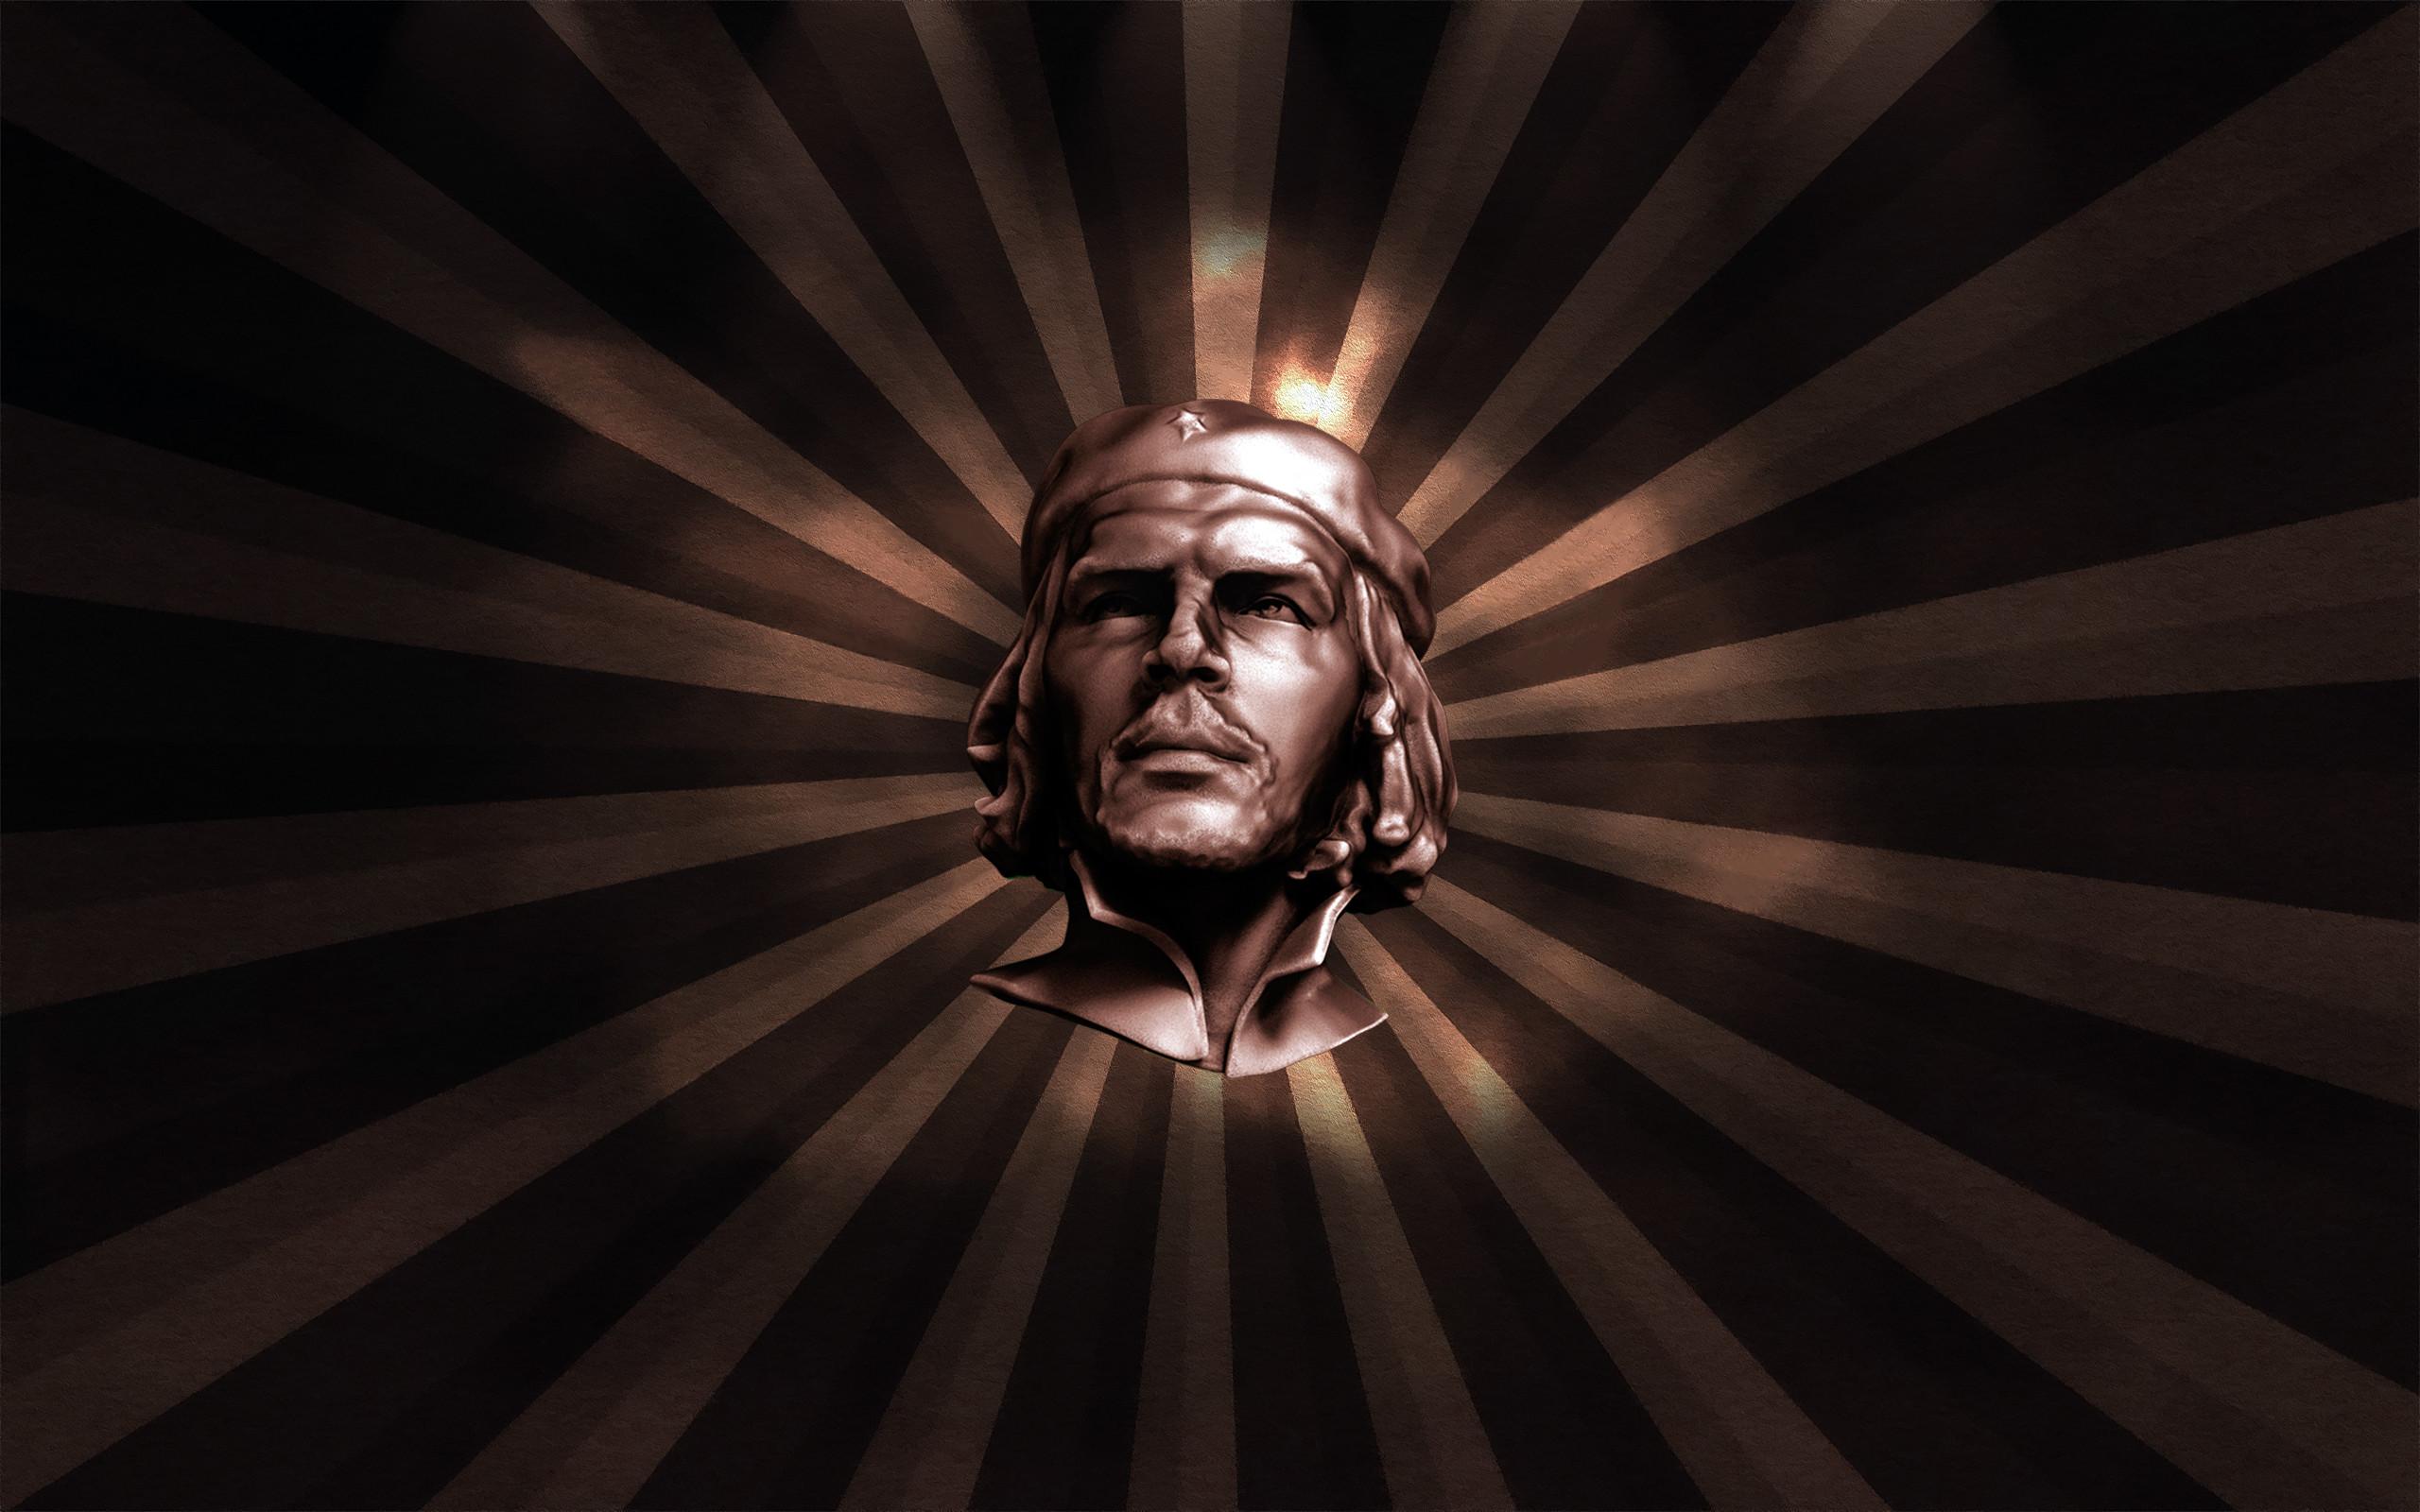 … Cyber Che Guevara, wallpaper by WalentyWalewski